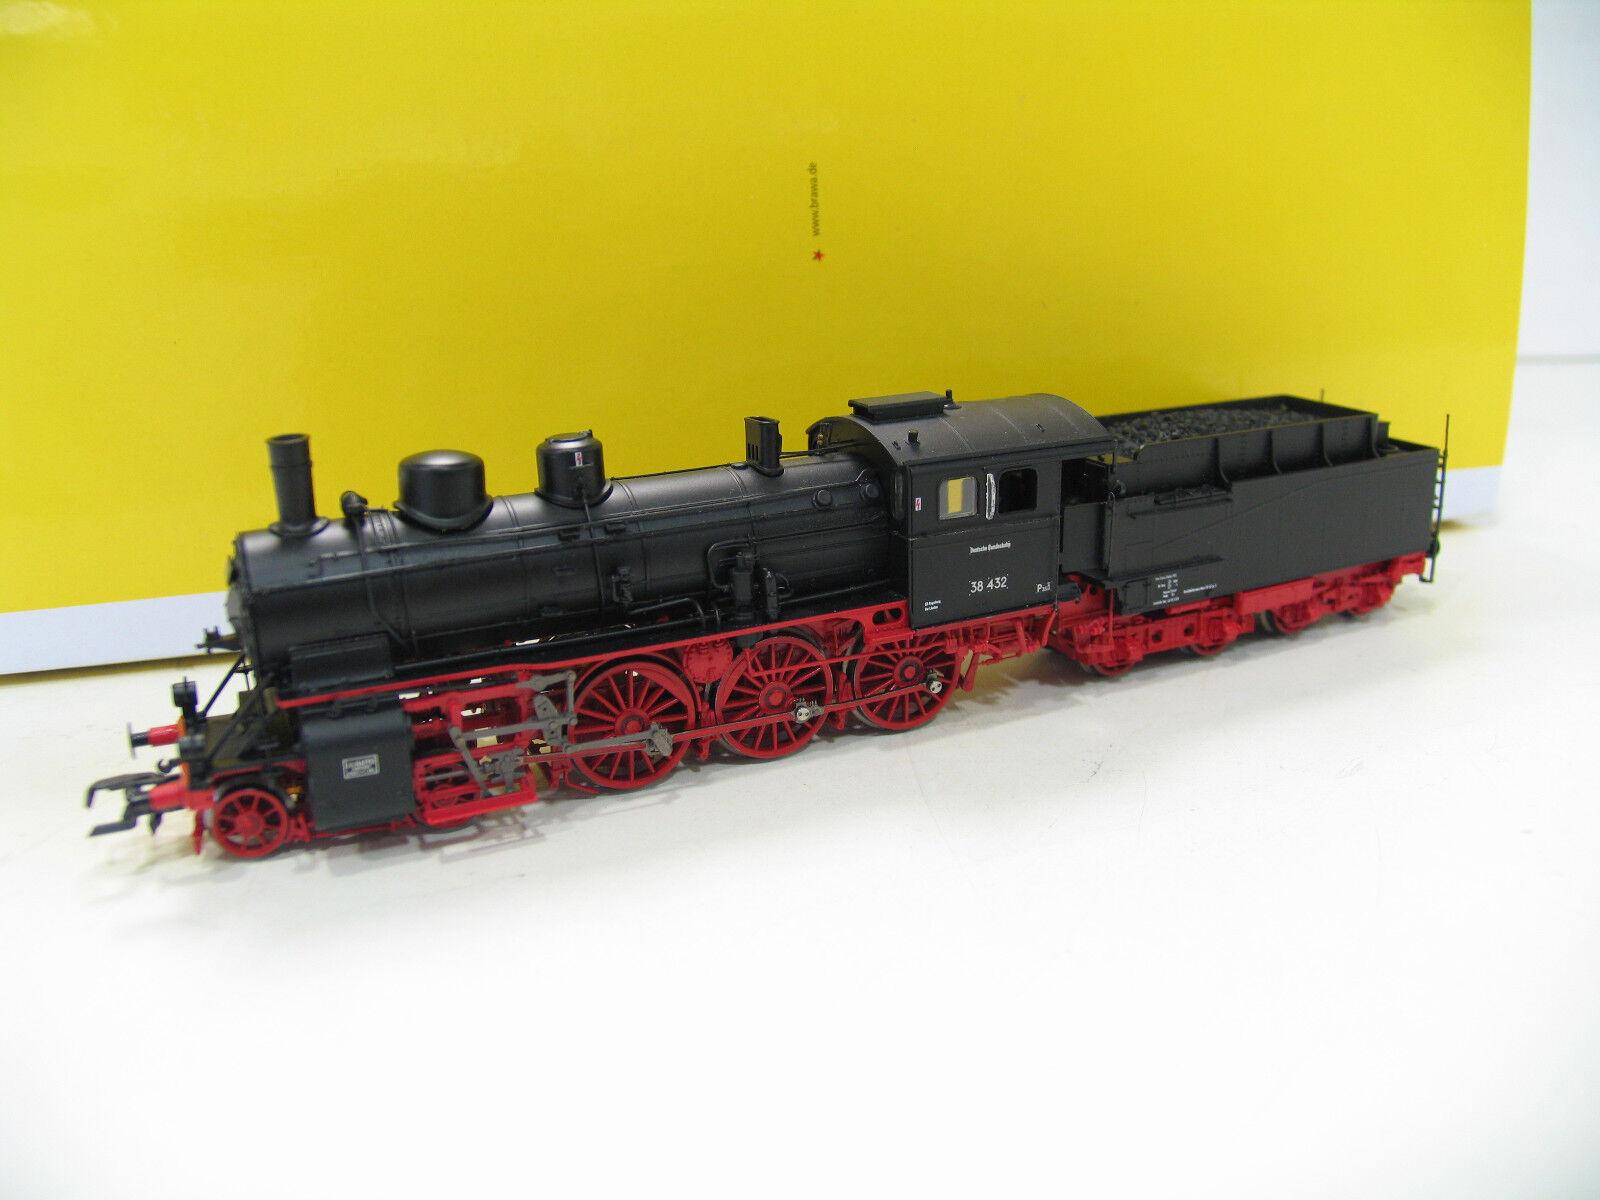 Brawa 40656 máquina de vapor br 38 432 de la DB digital Sound lk346